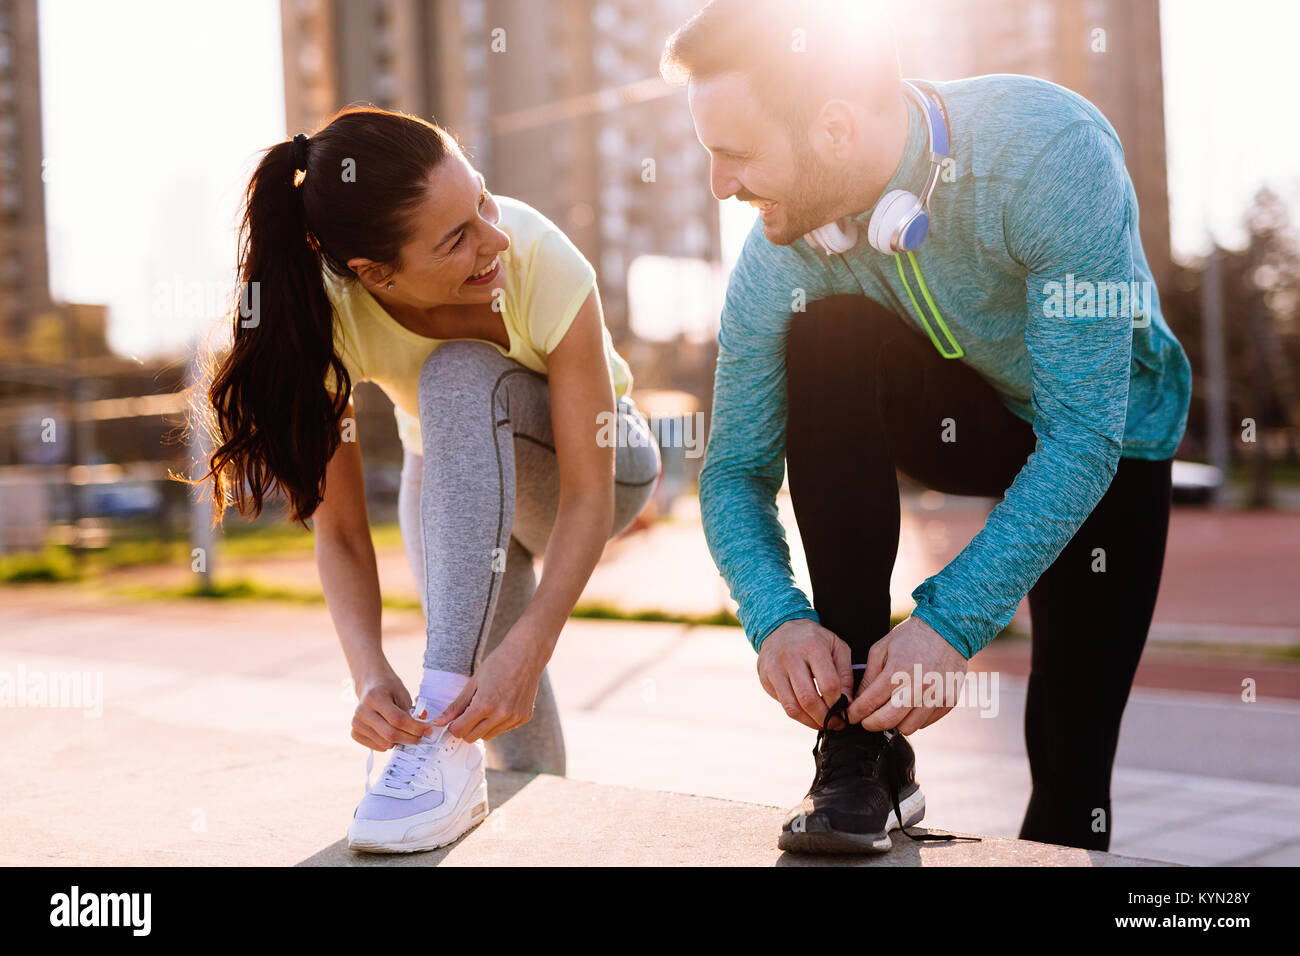 Läufer binden Laufschuhe und betriebsbereit Stockbild